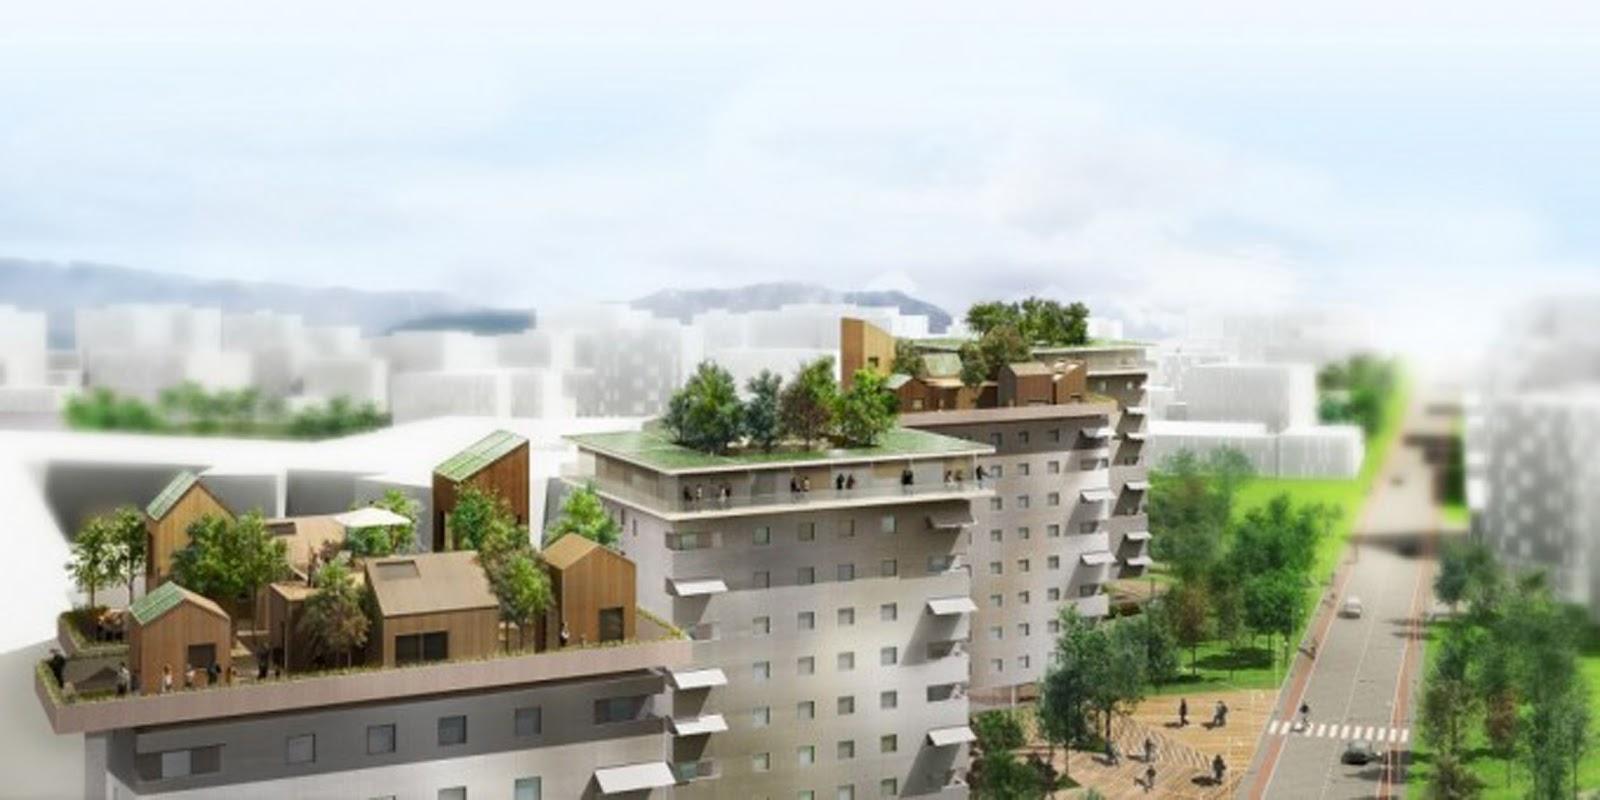 Kuwait School In Gaza Mca Mario Cucinella Architects - Mario ...